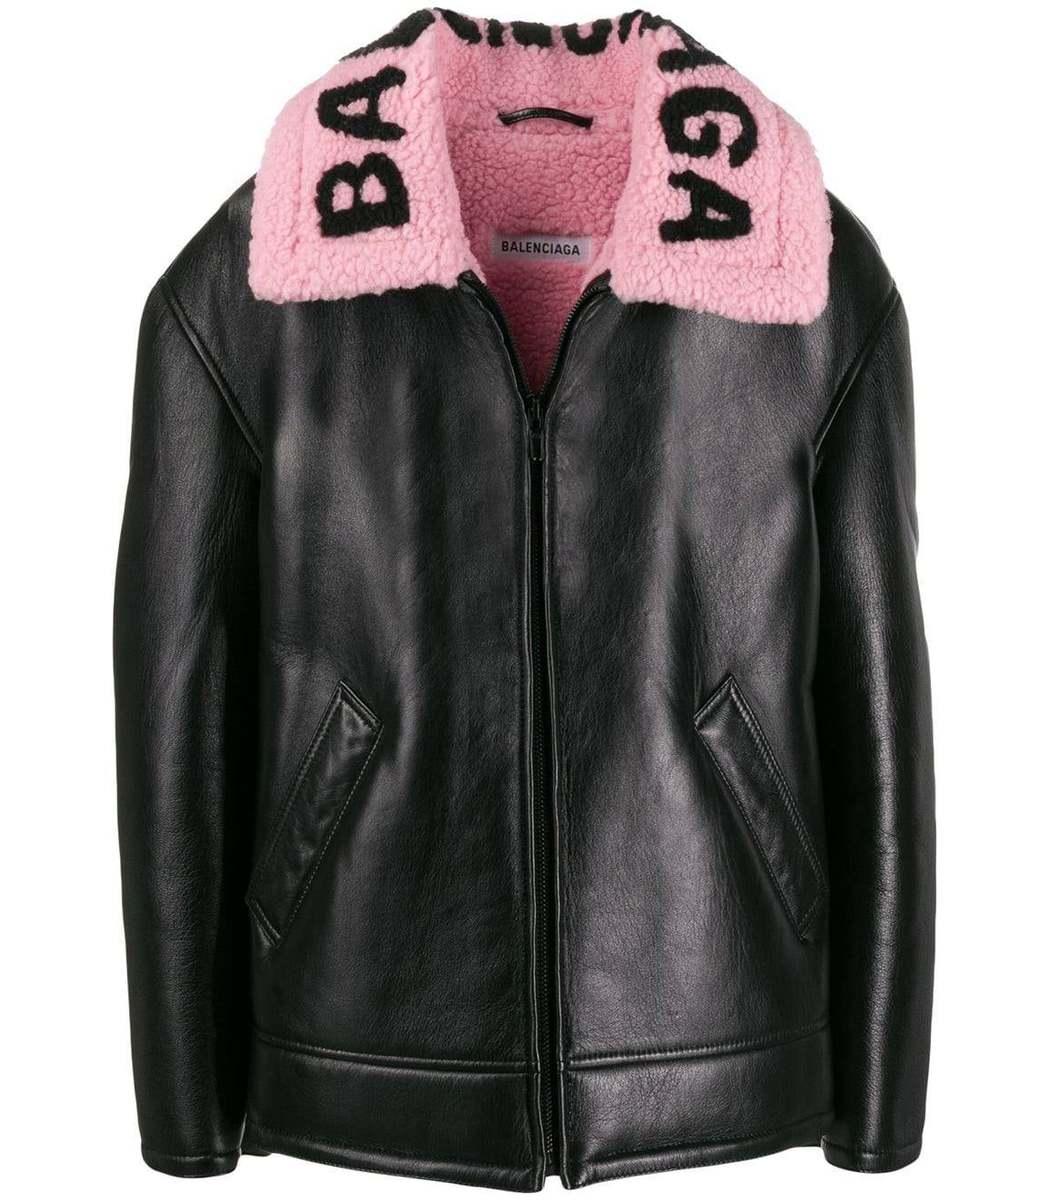 Balenciaga Jackets Contrast Collar Leather Jacket